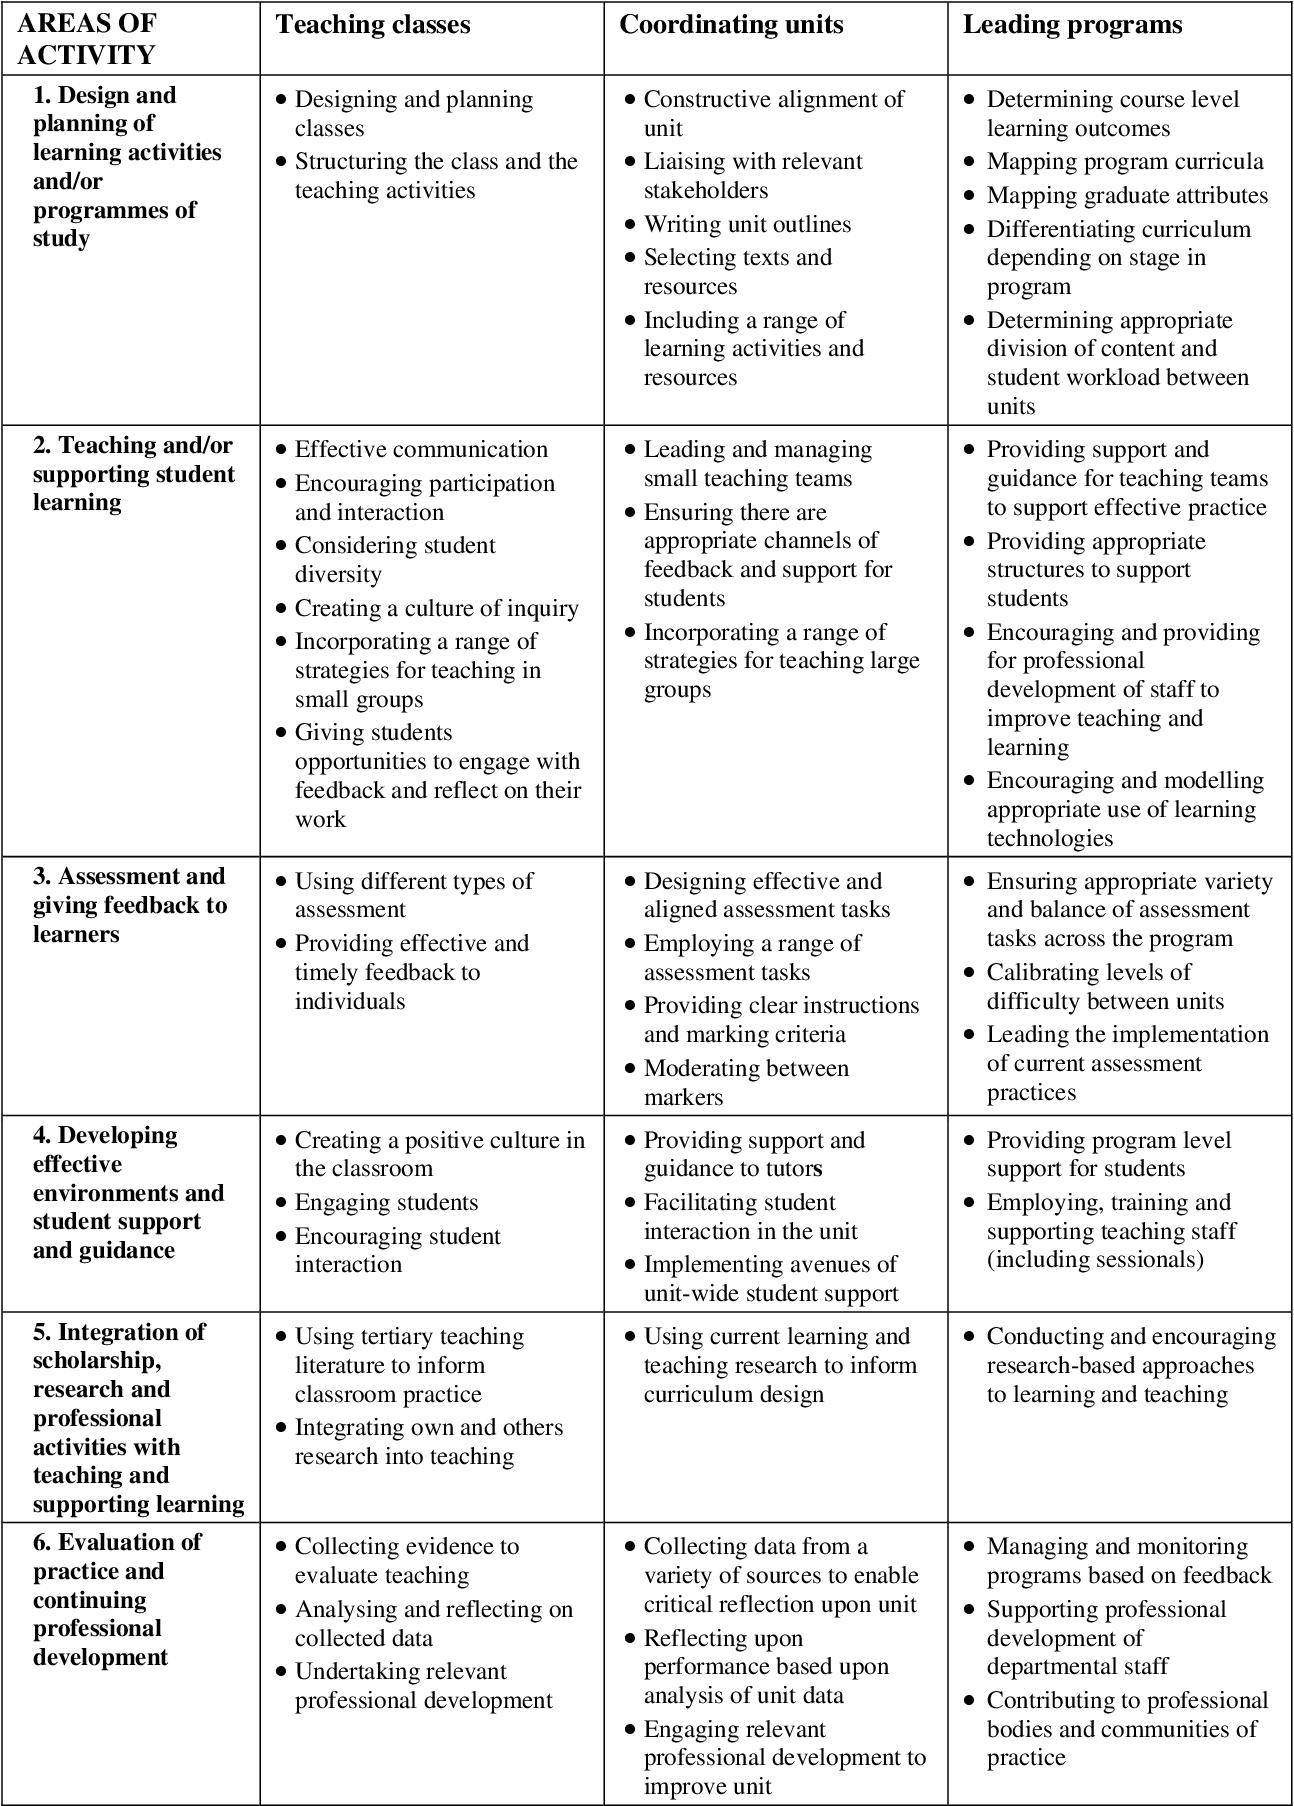 Pdf A Professional Development Framework For Teaching In Higher Education Semantic Scholar